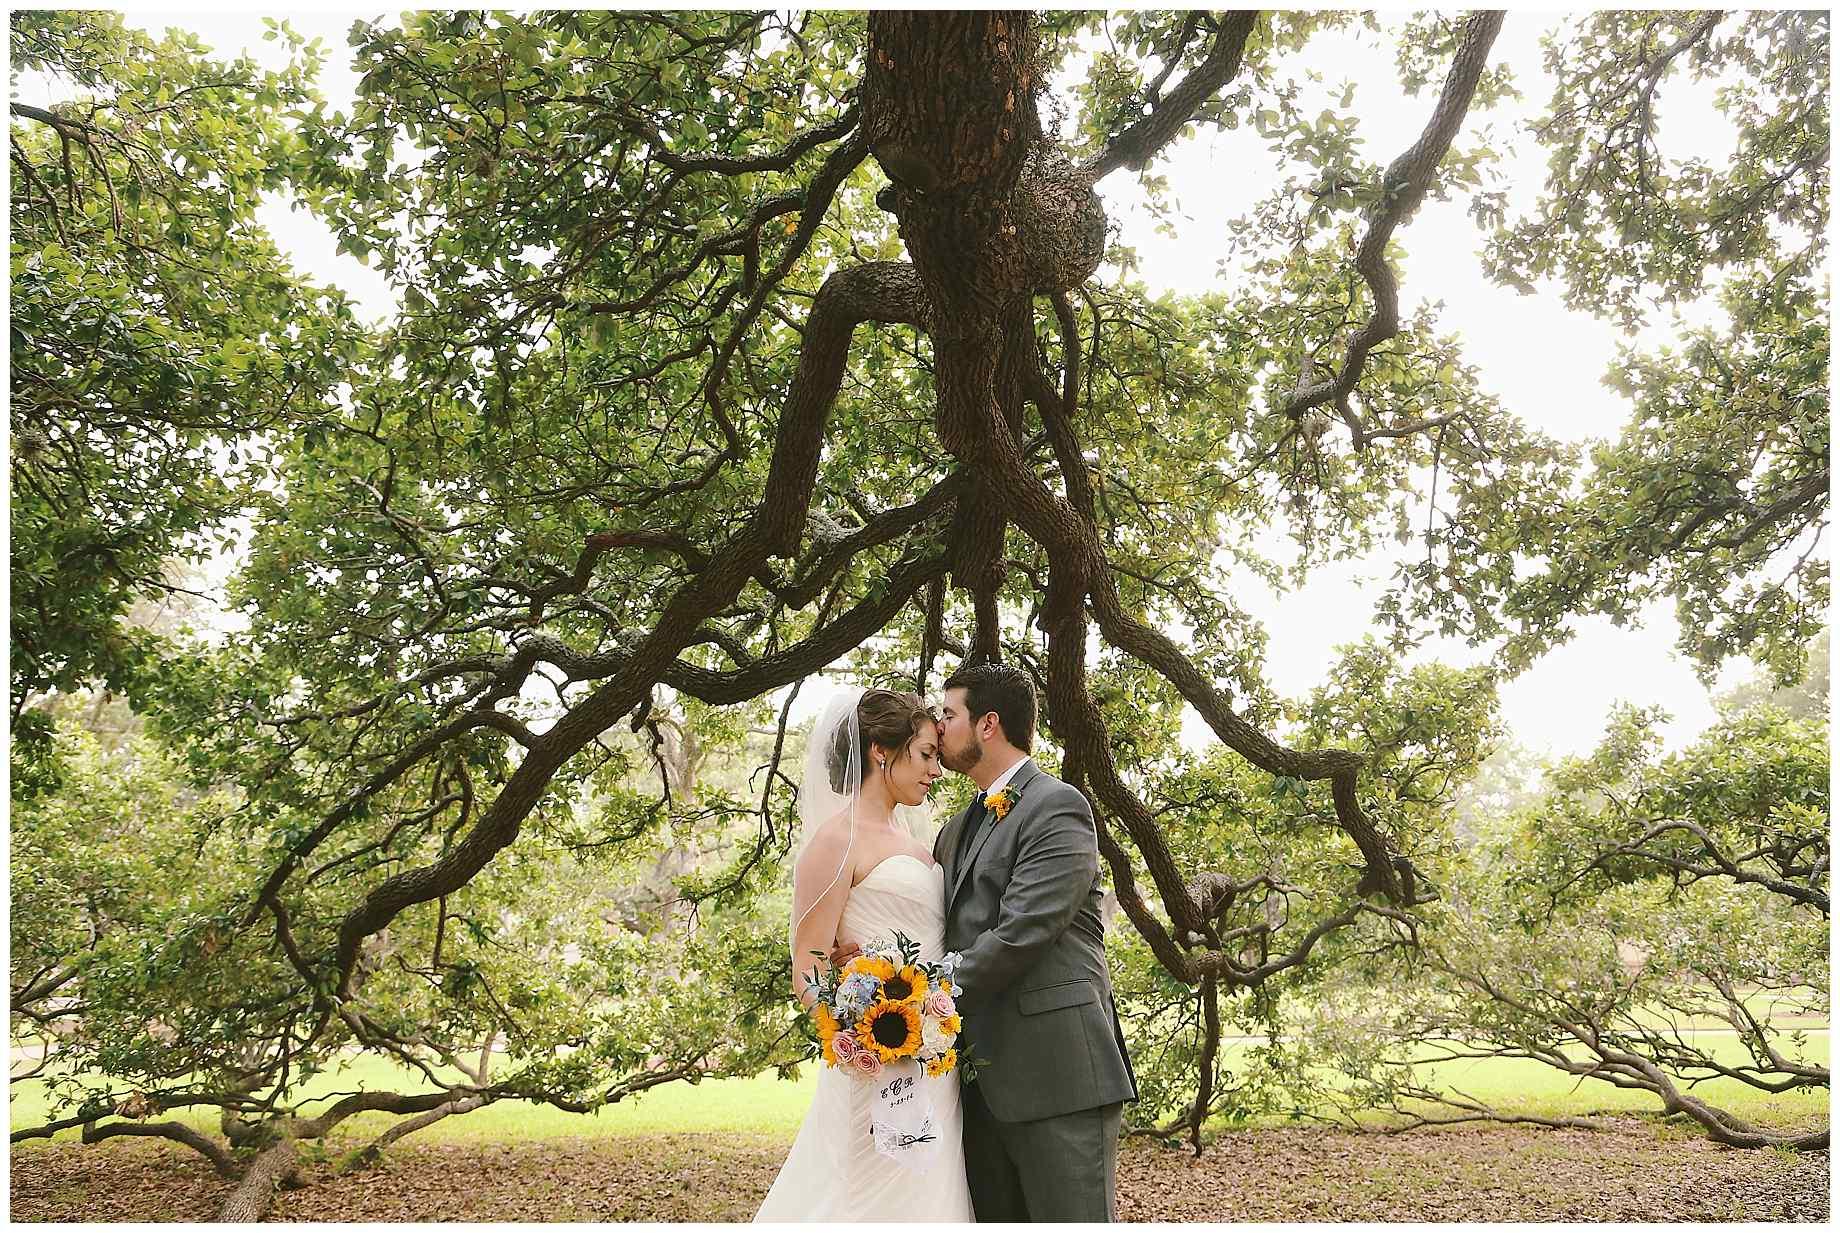 aggie-century-tree-wedding-23